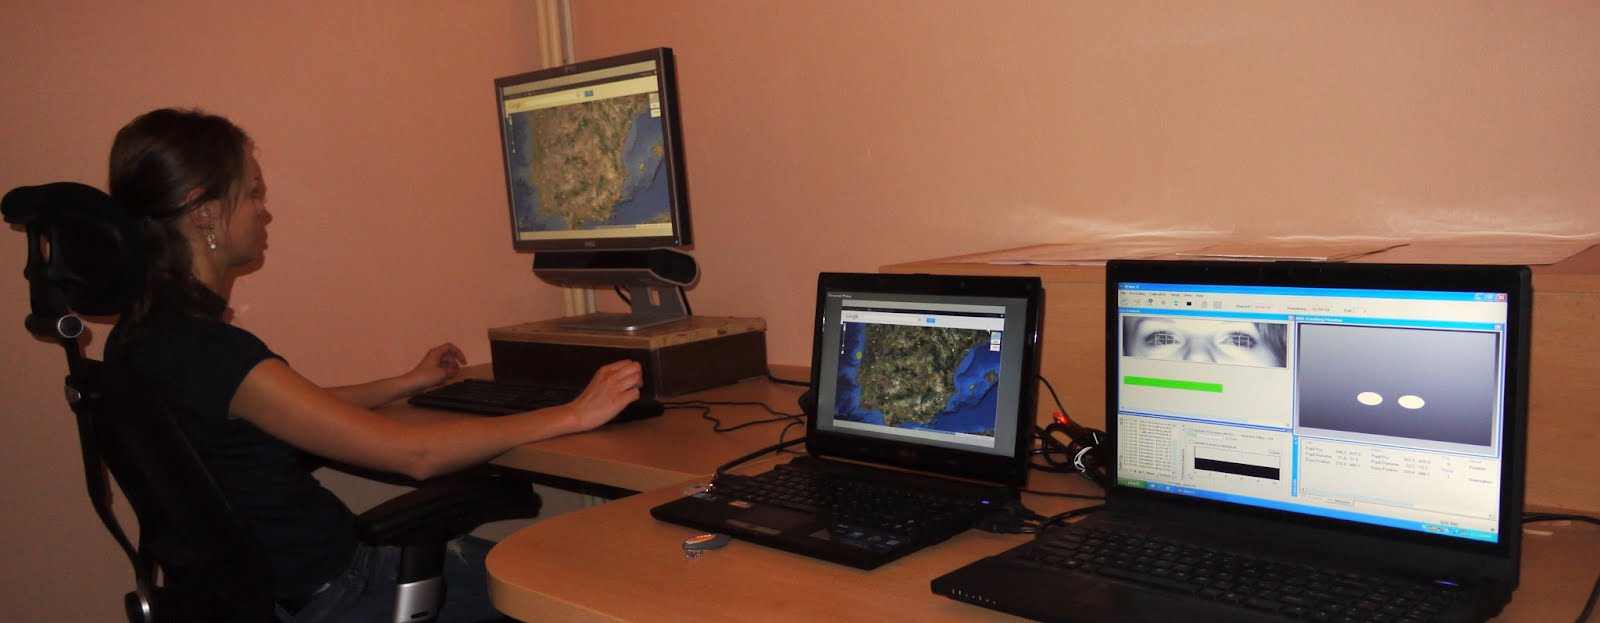 Advanced Map Optimalization Based on Eye-Tracking | IntechOpen